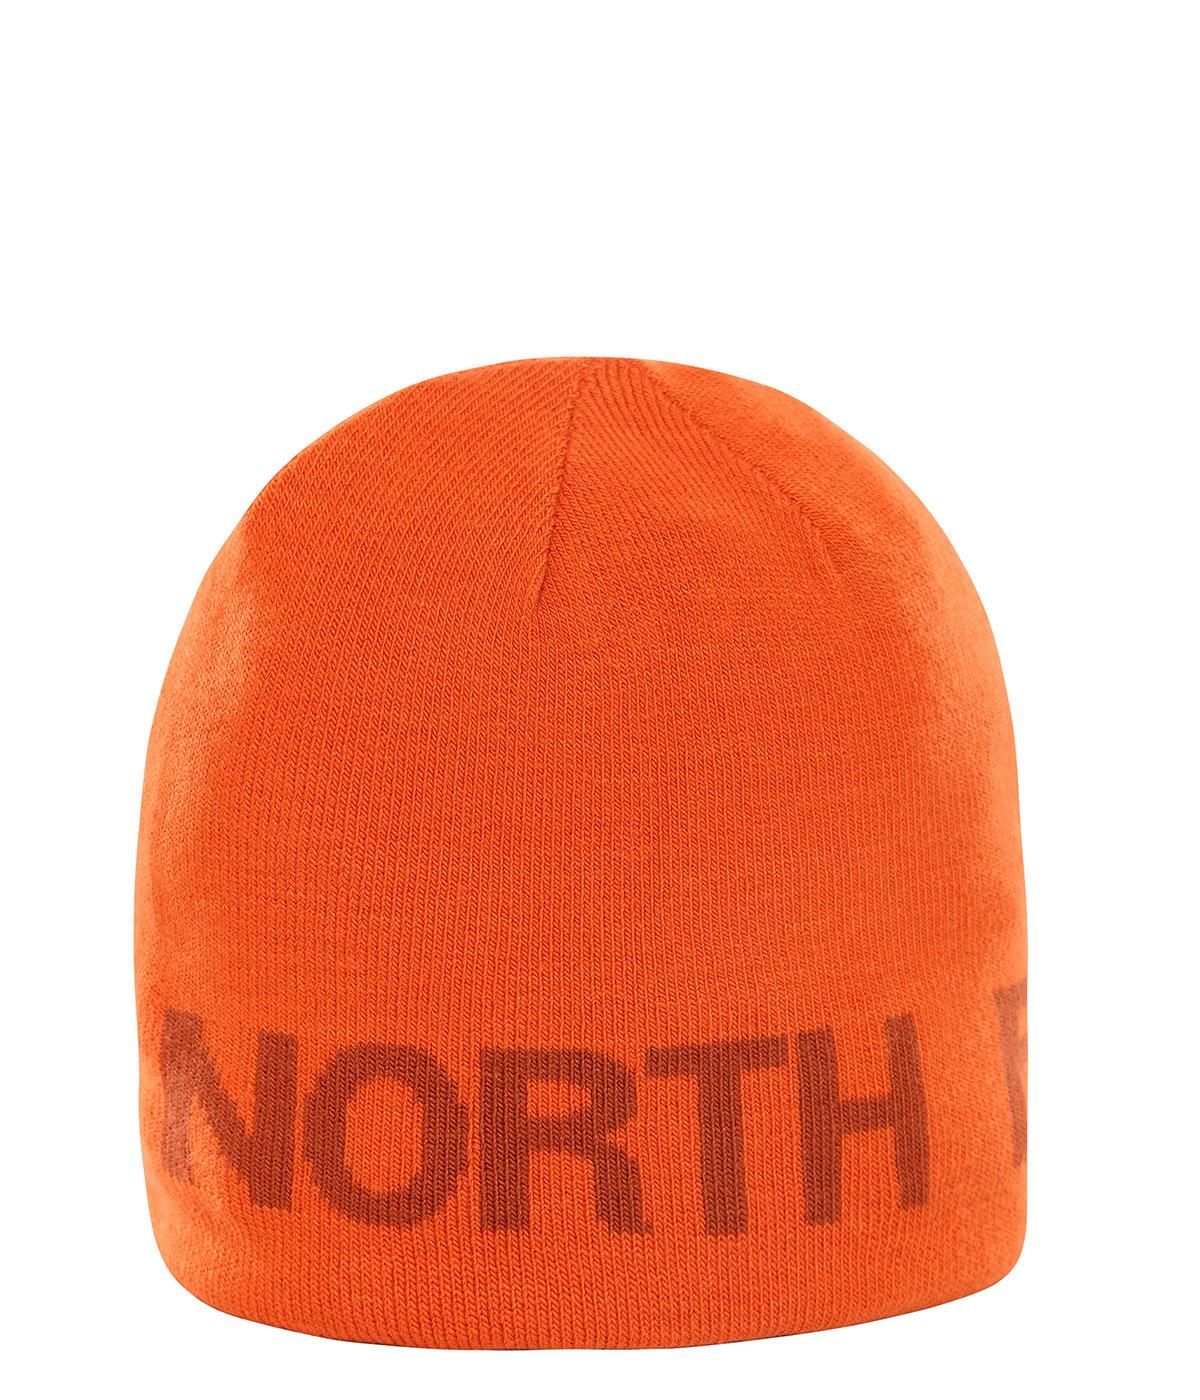 The North Face Rvsbl Tnf Banner Bere Nf00Akndel91